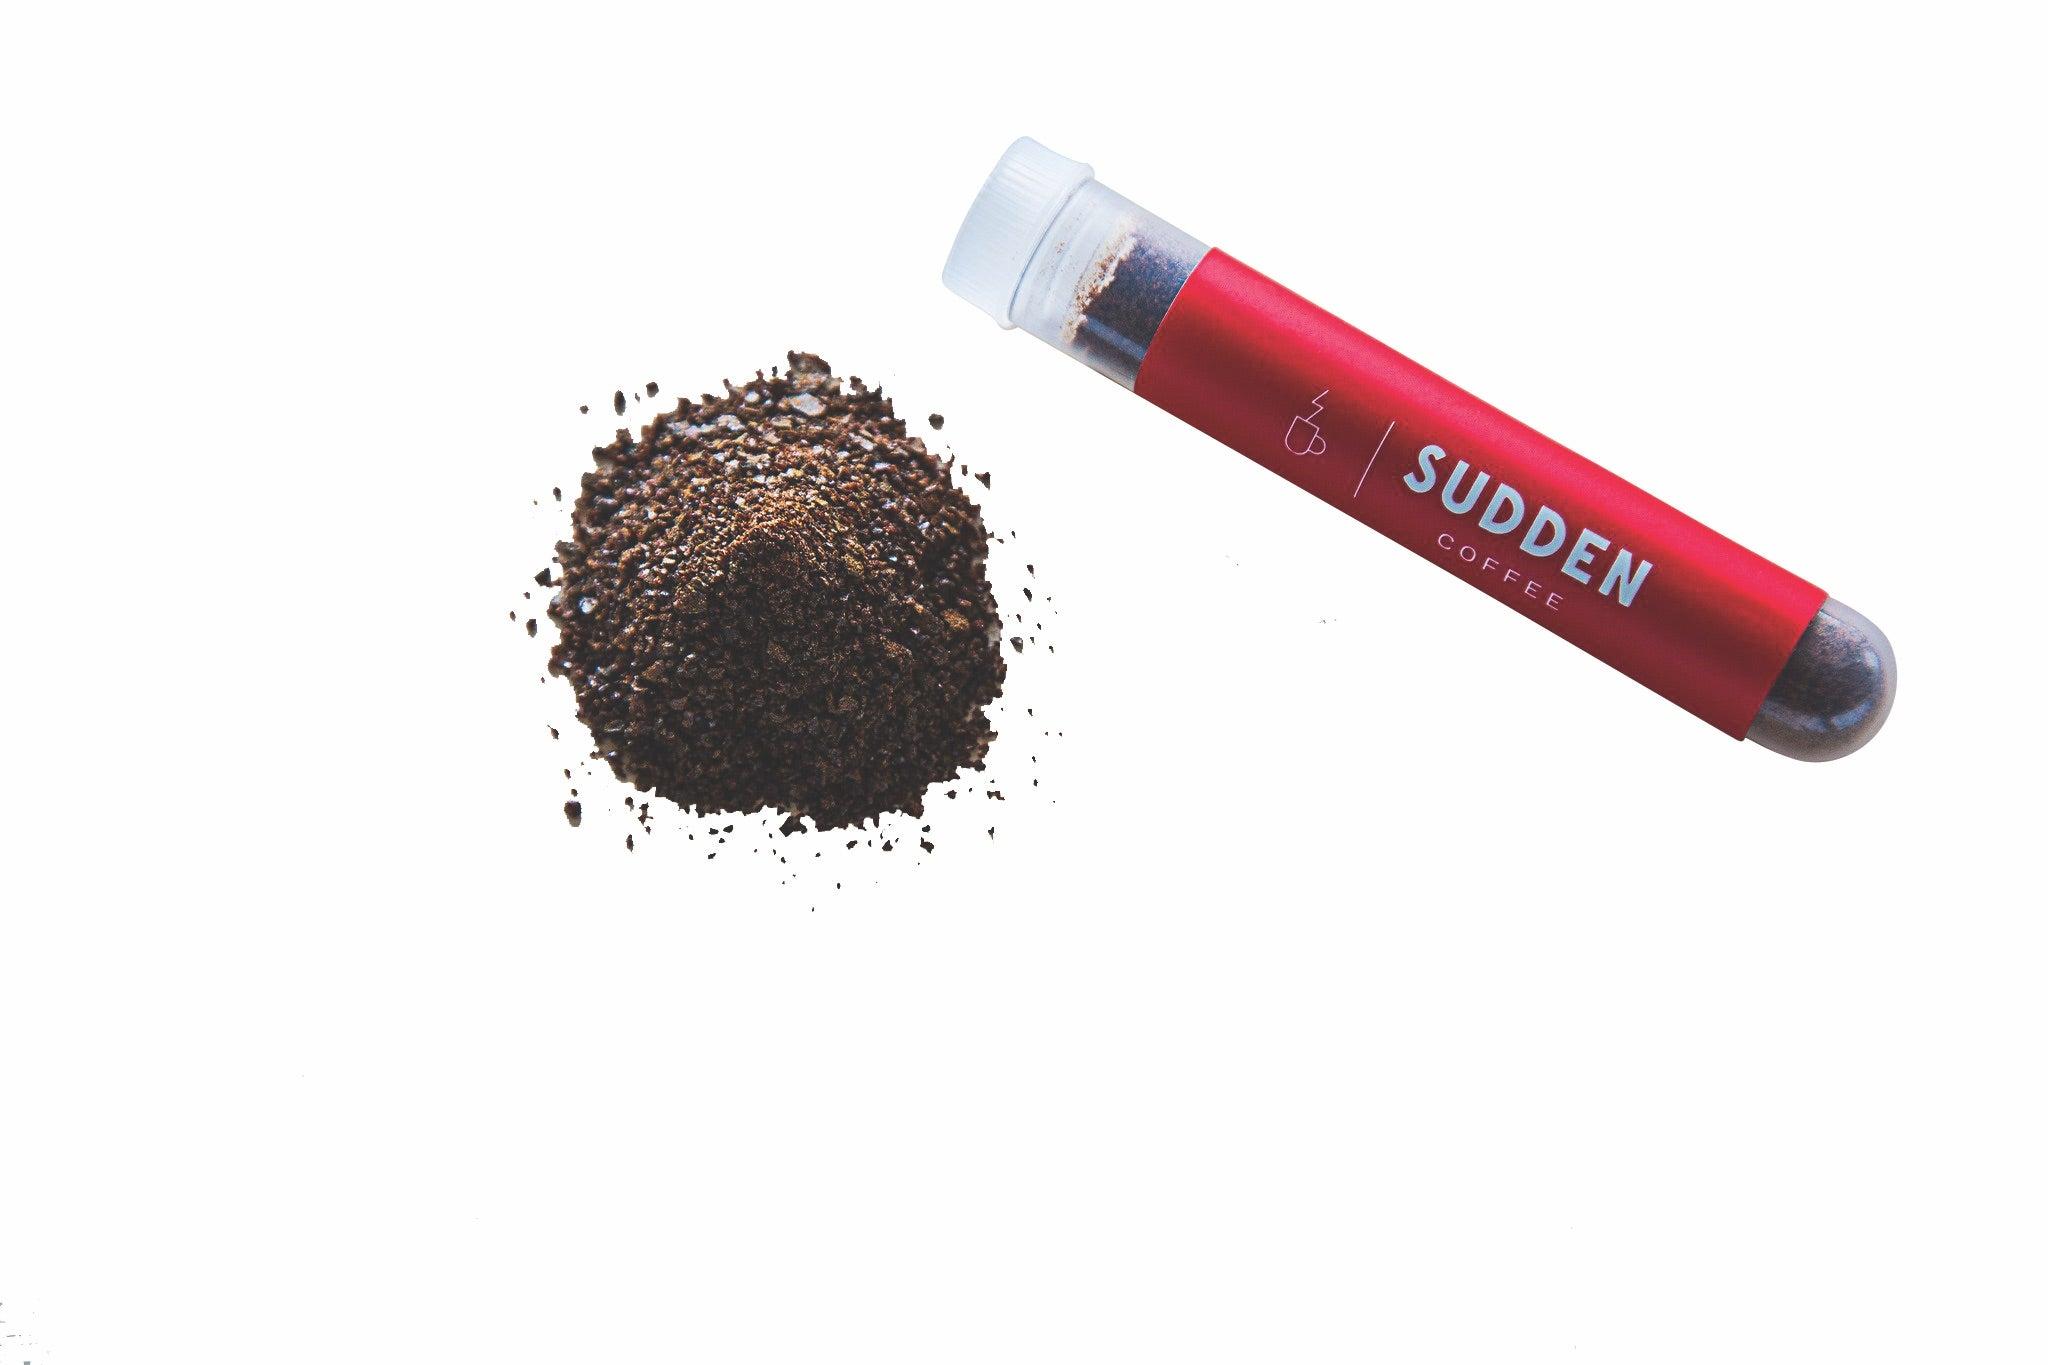 02_19_2017_Sudden_Coffee-070-Edit_fb47ba45-0c2e-44da-bd65-bac4d15a141a_2048x2048